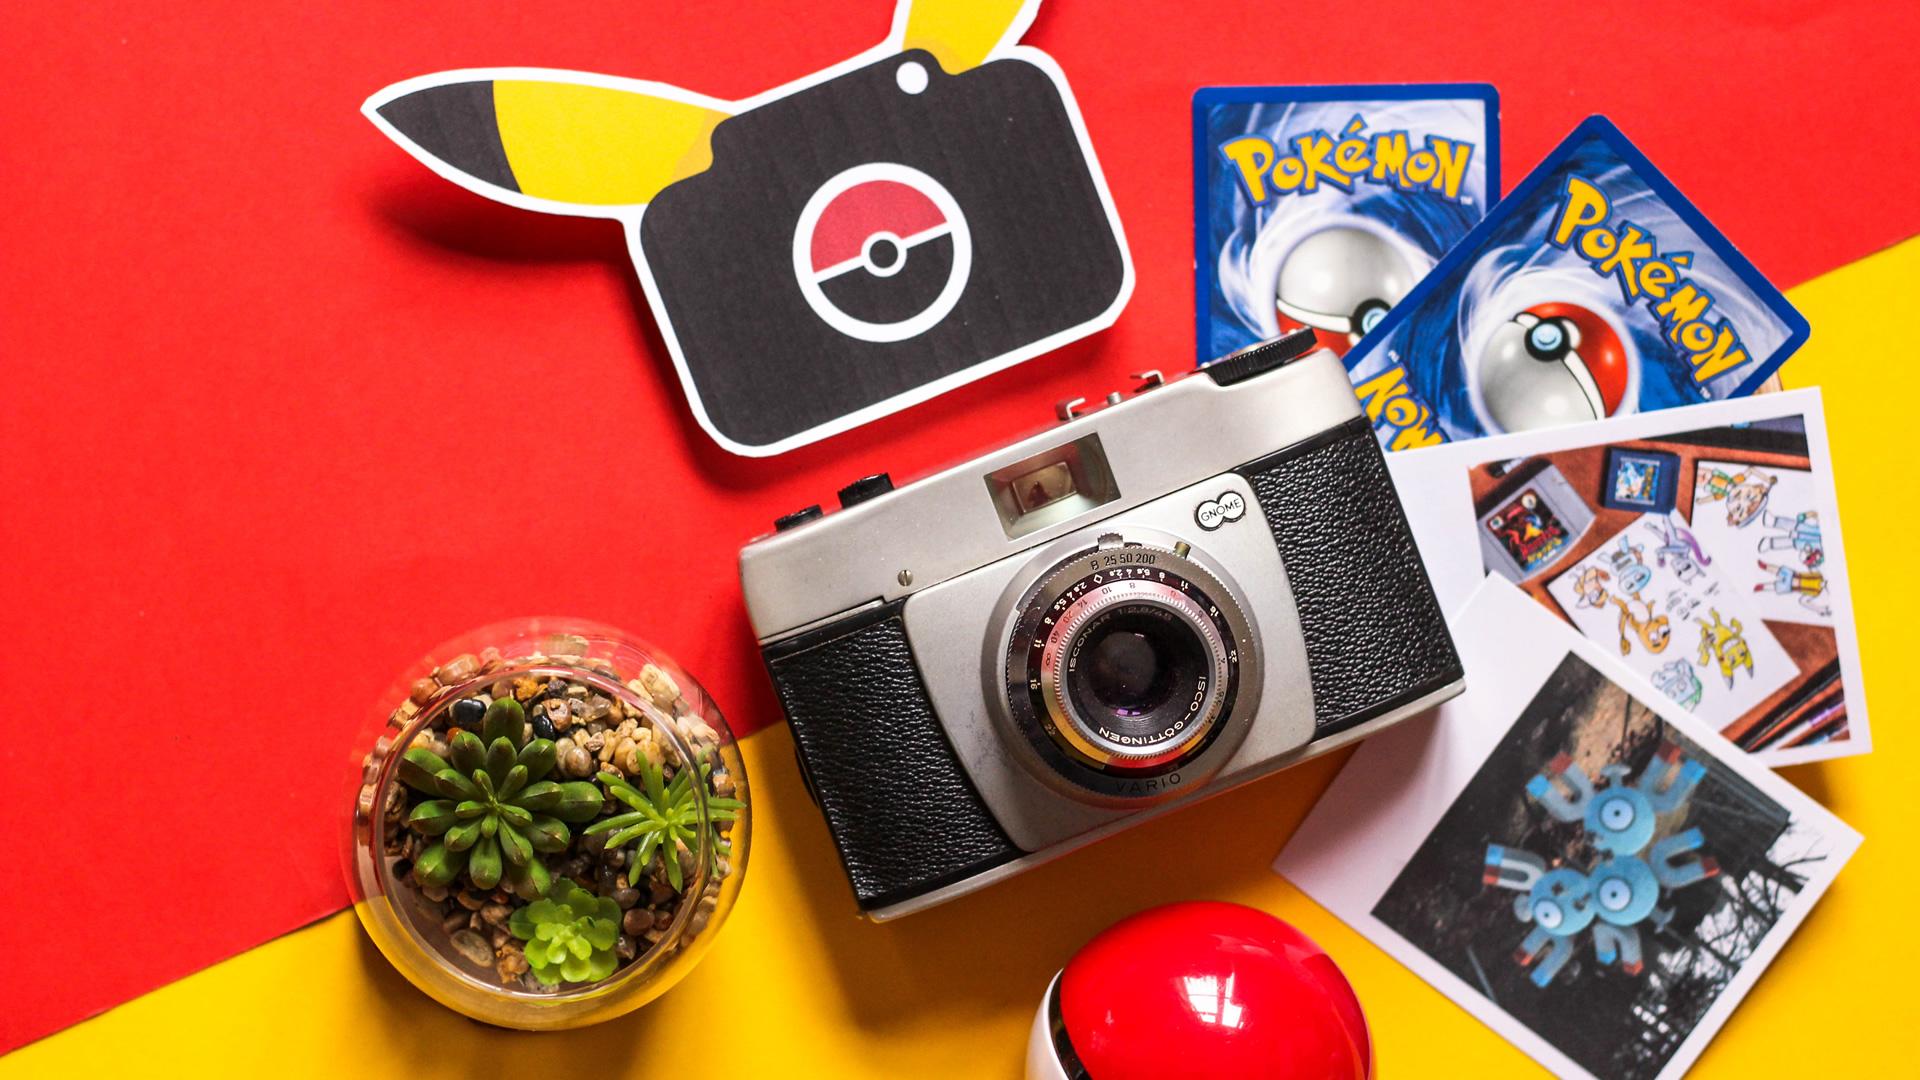 #PokemonSnapWeek – Celebrating 20 Years of Pokemon Snap!